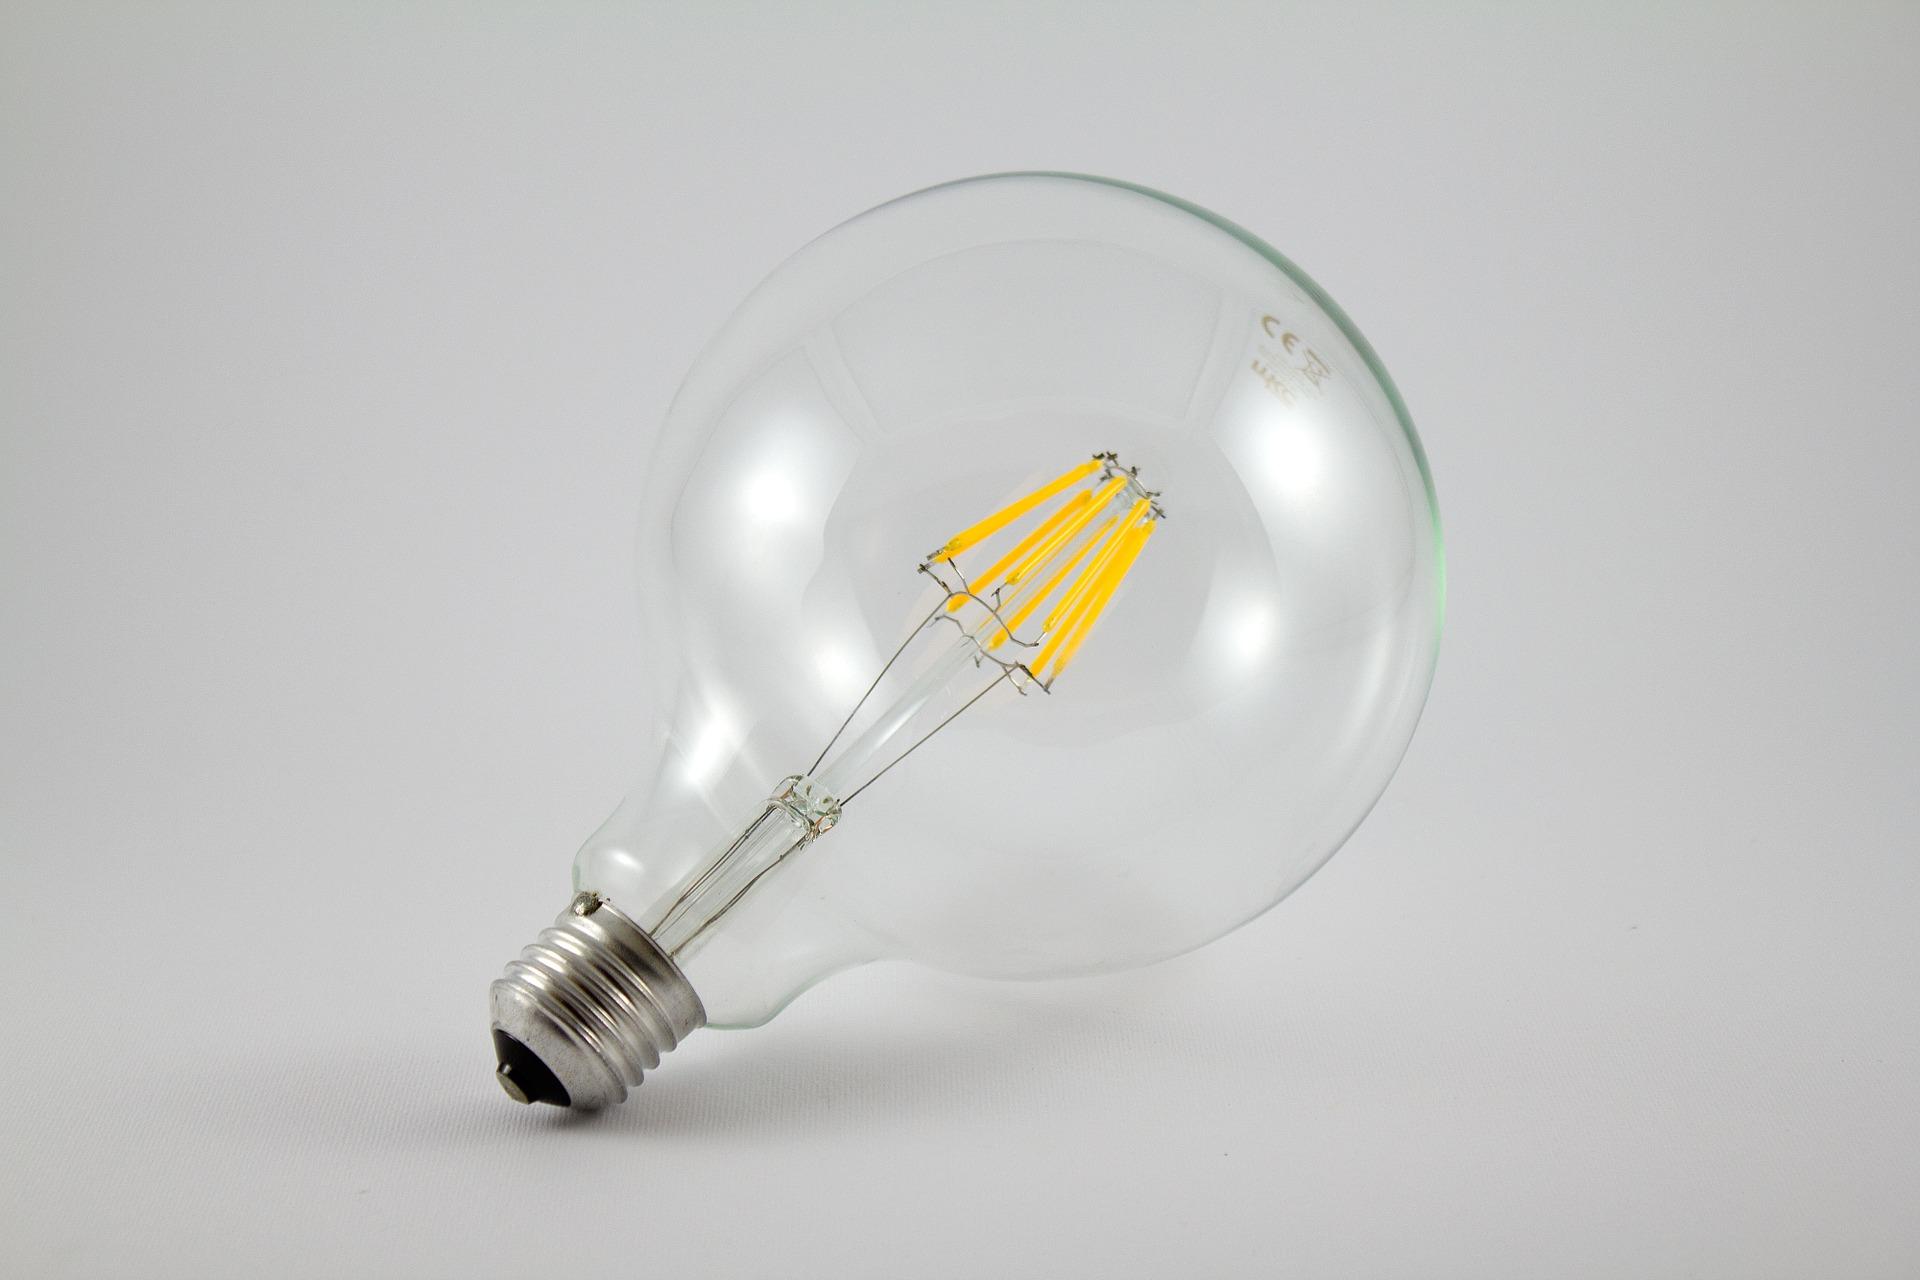 renew the season with led lights